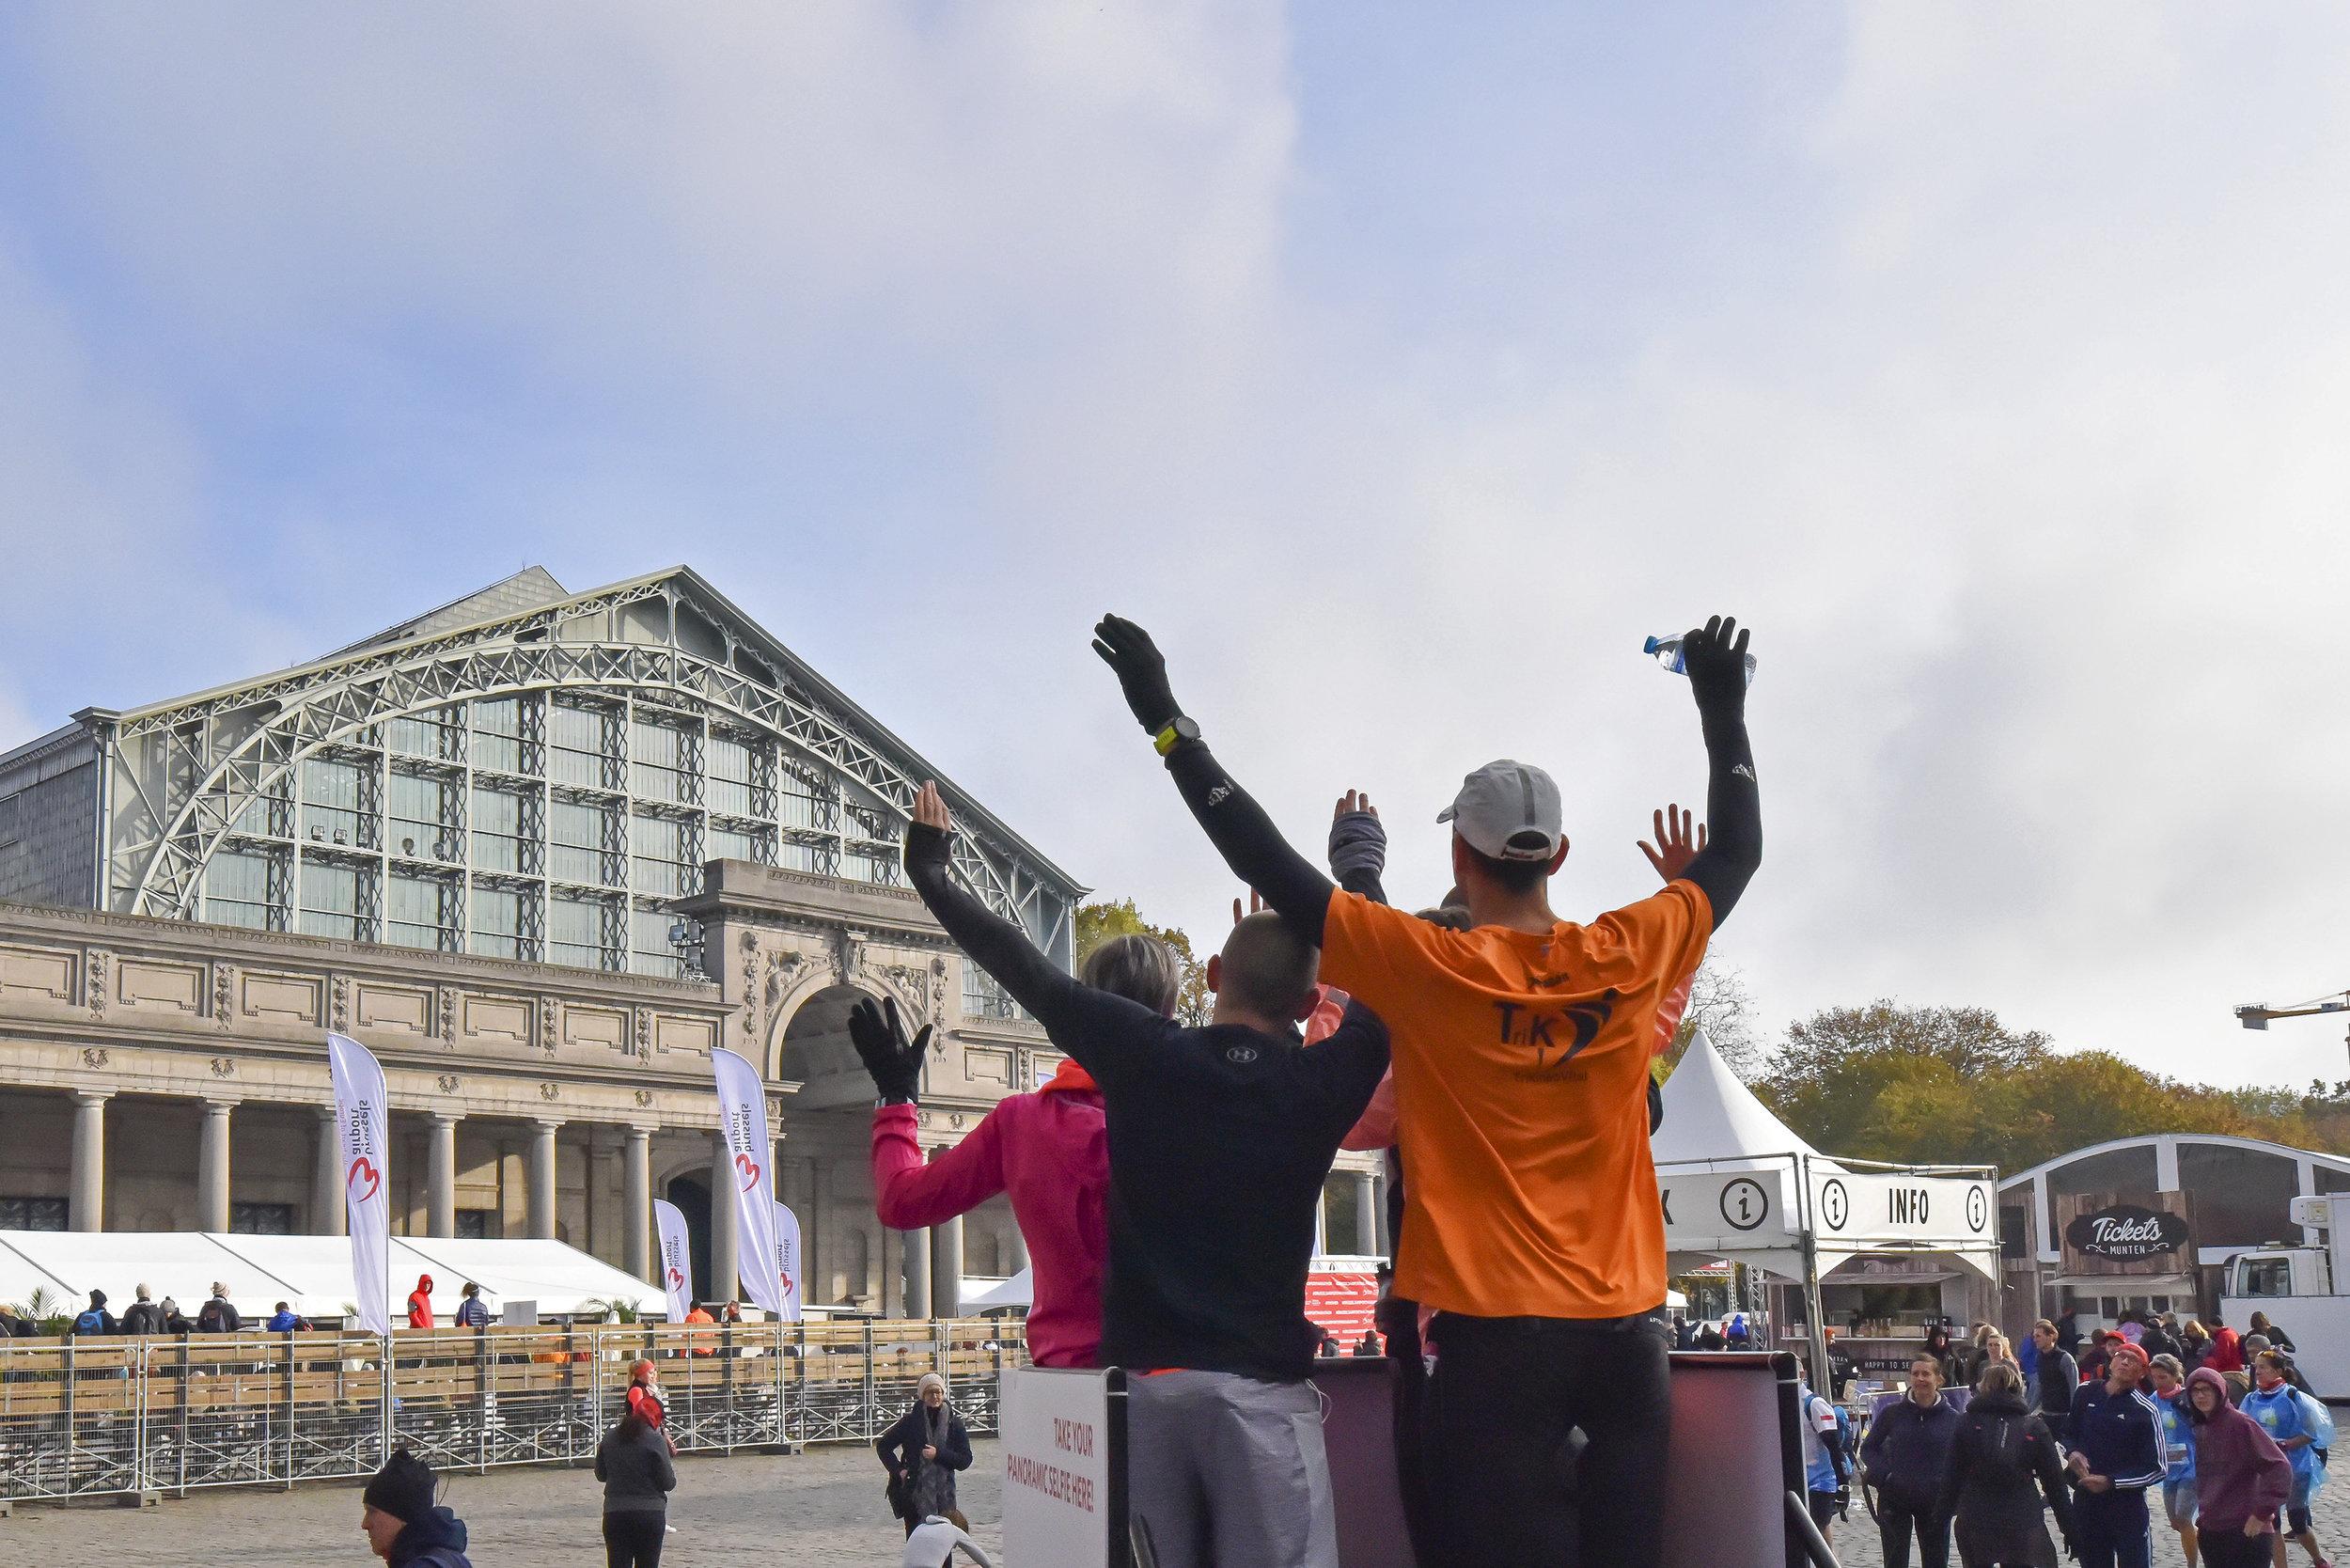 PANORA-ME_Brussels-Marathon-2018_11.jpg